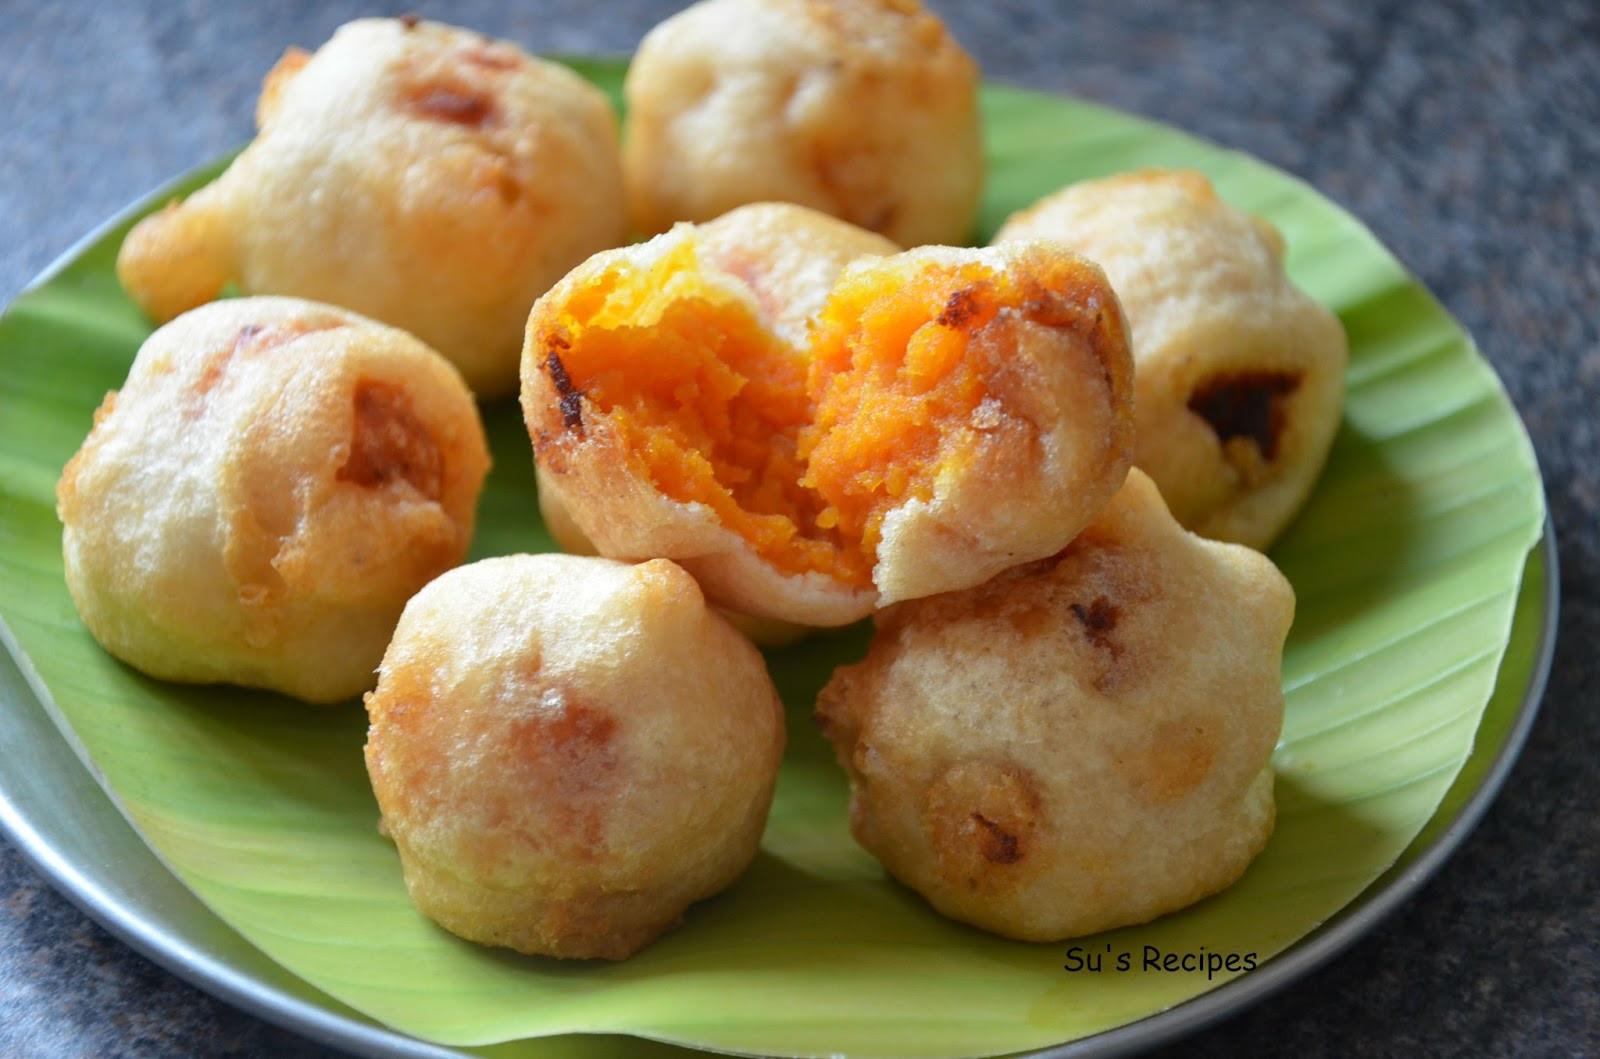 Sweet Potato Dessert Recipe  Su s Recipes Boorelu Sweet Potato Dessert